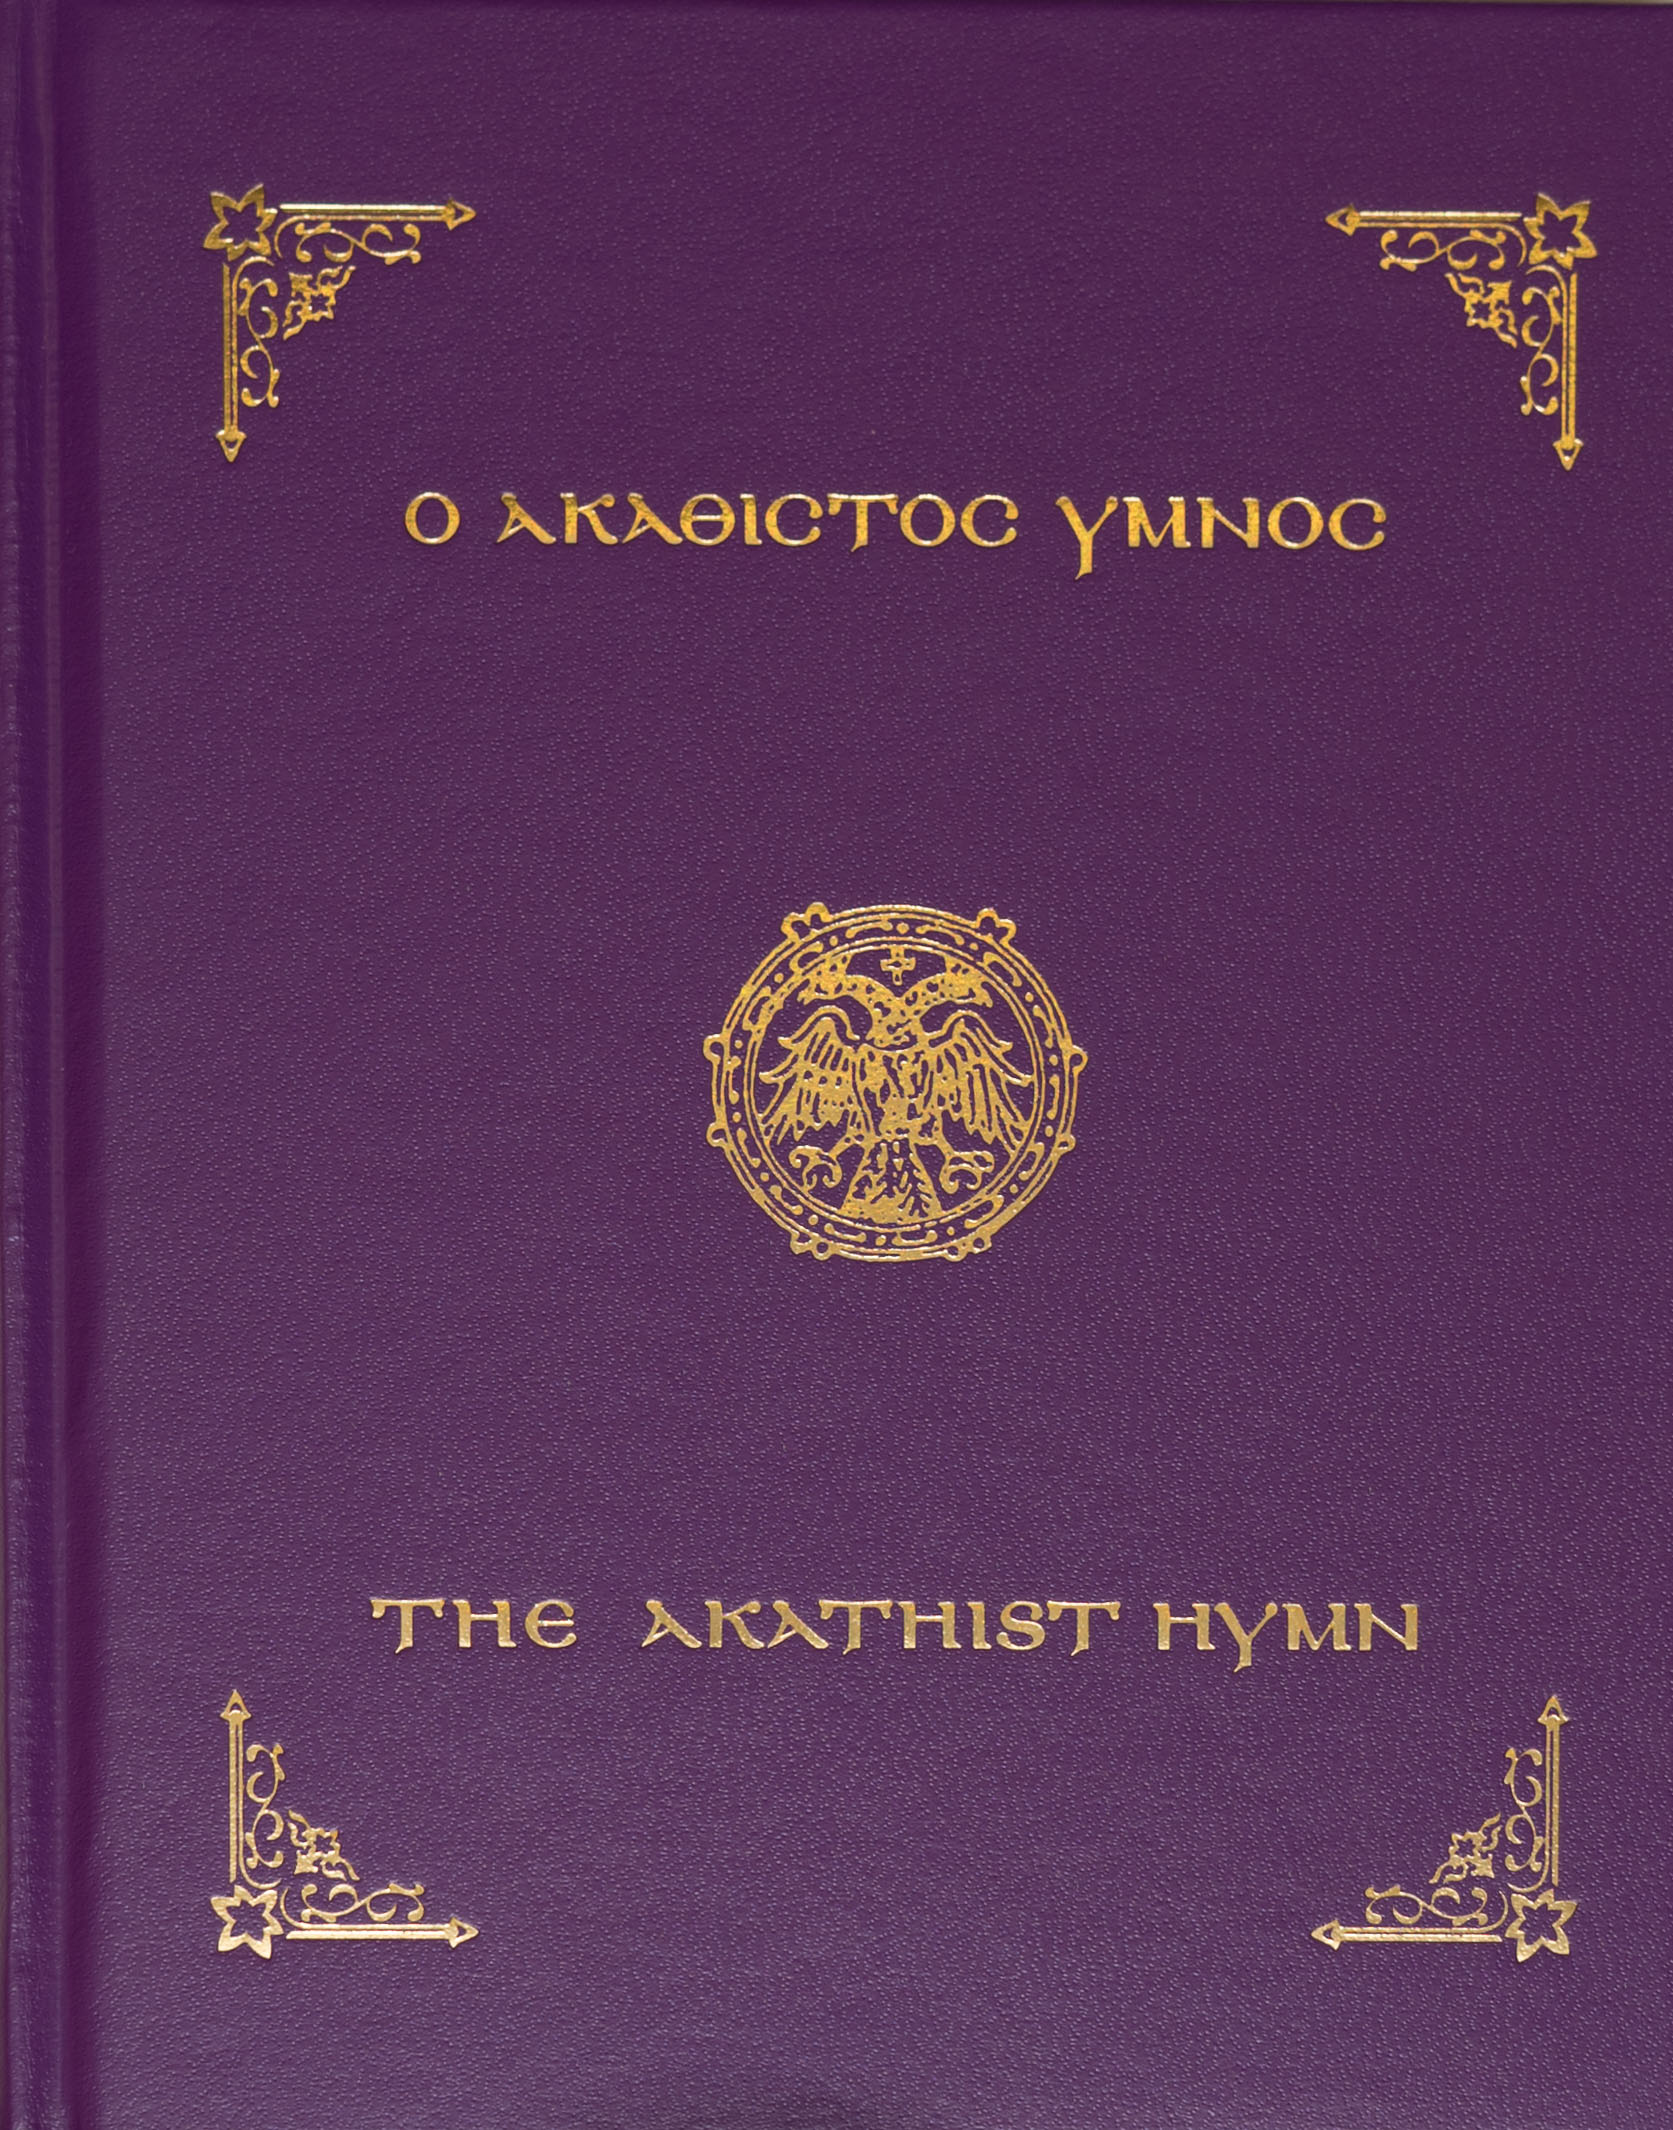 The Akathist Hymn (Hairetismi) – Ο Ακάθιστος Υμνος (Χαιρετισμοί)